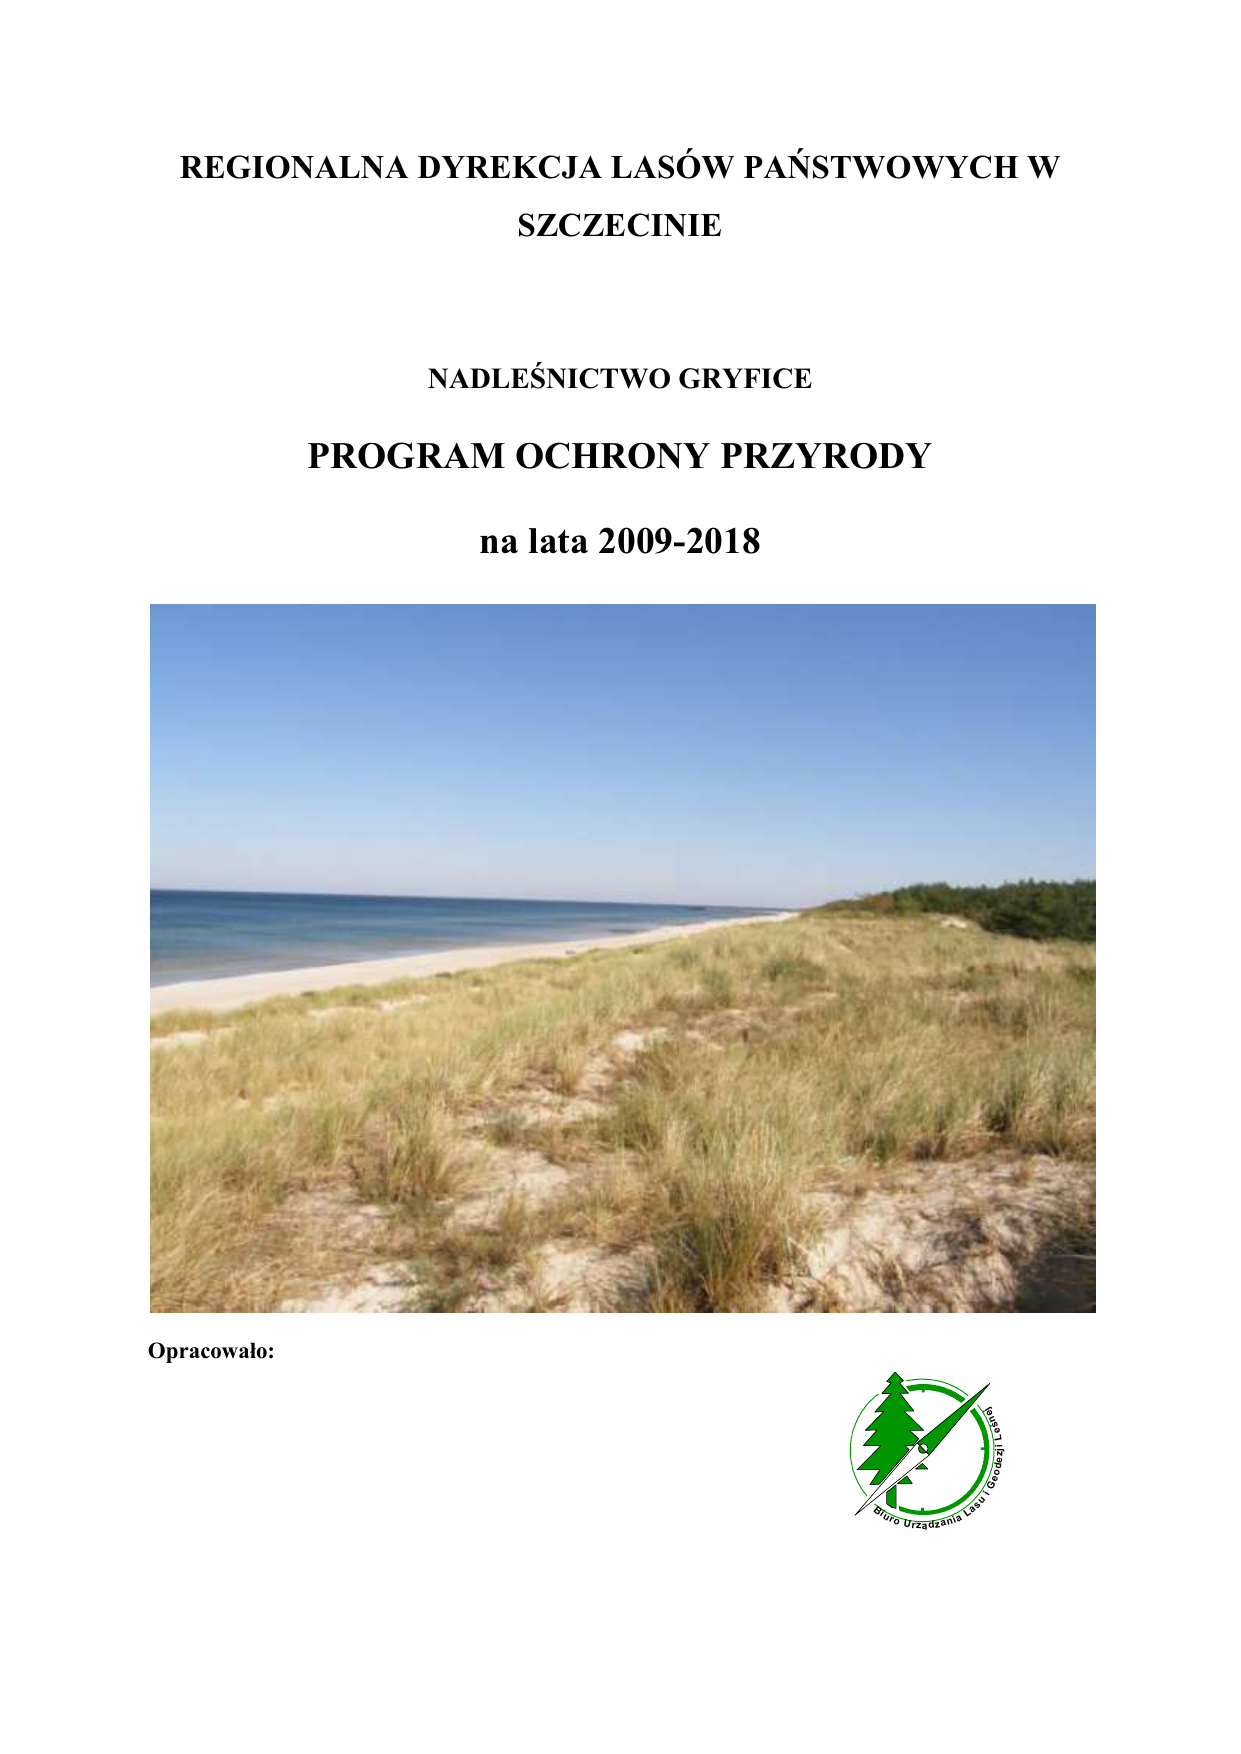 ba322eb7fab150 PROGRAM OCHRONY PRZYRODY na lata 2009-2018